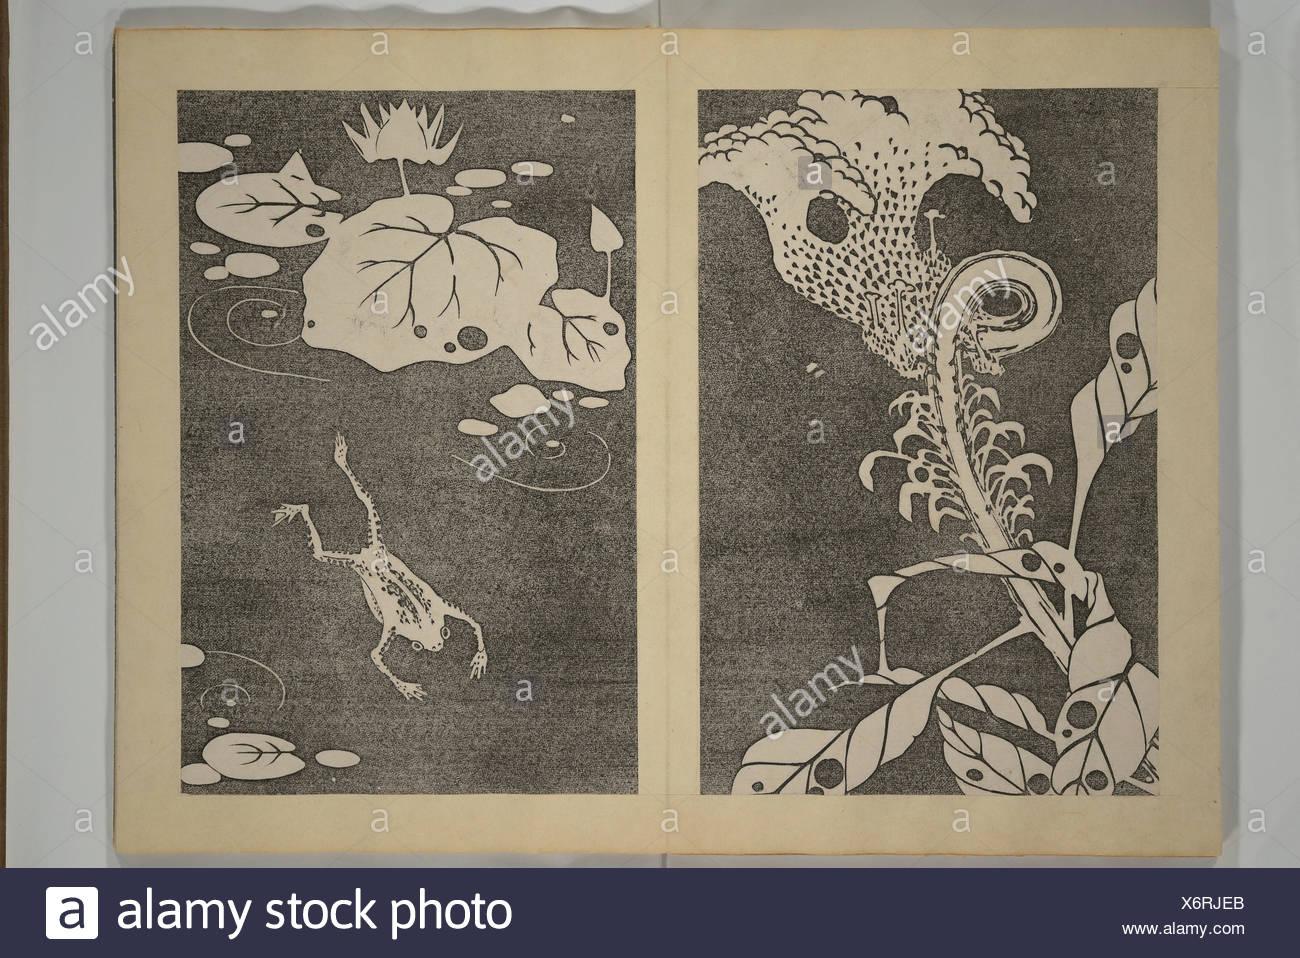 Jakuchu Picture Album (Jakuchu gajo). Artist: Ito Jakuchu (Japanese, 1716-1800);  Period: Meiji period (1868-1912); Date: ca. 1900; Culture: Japan;